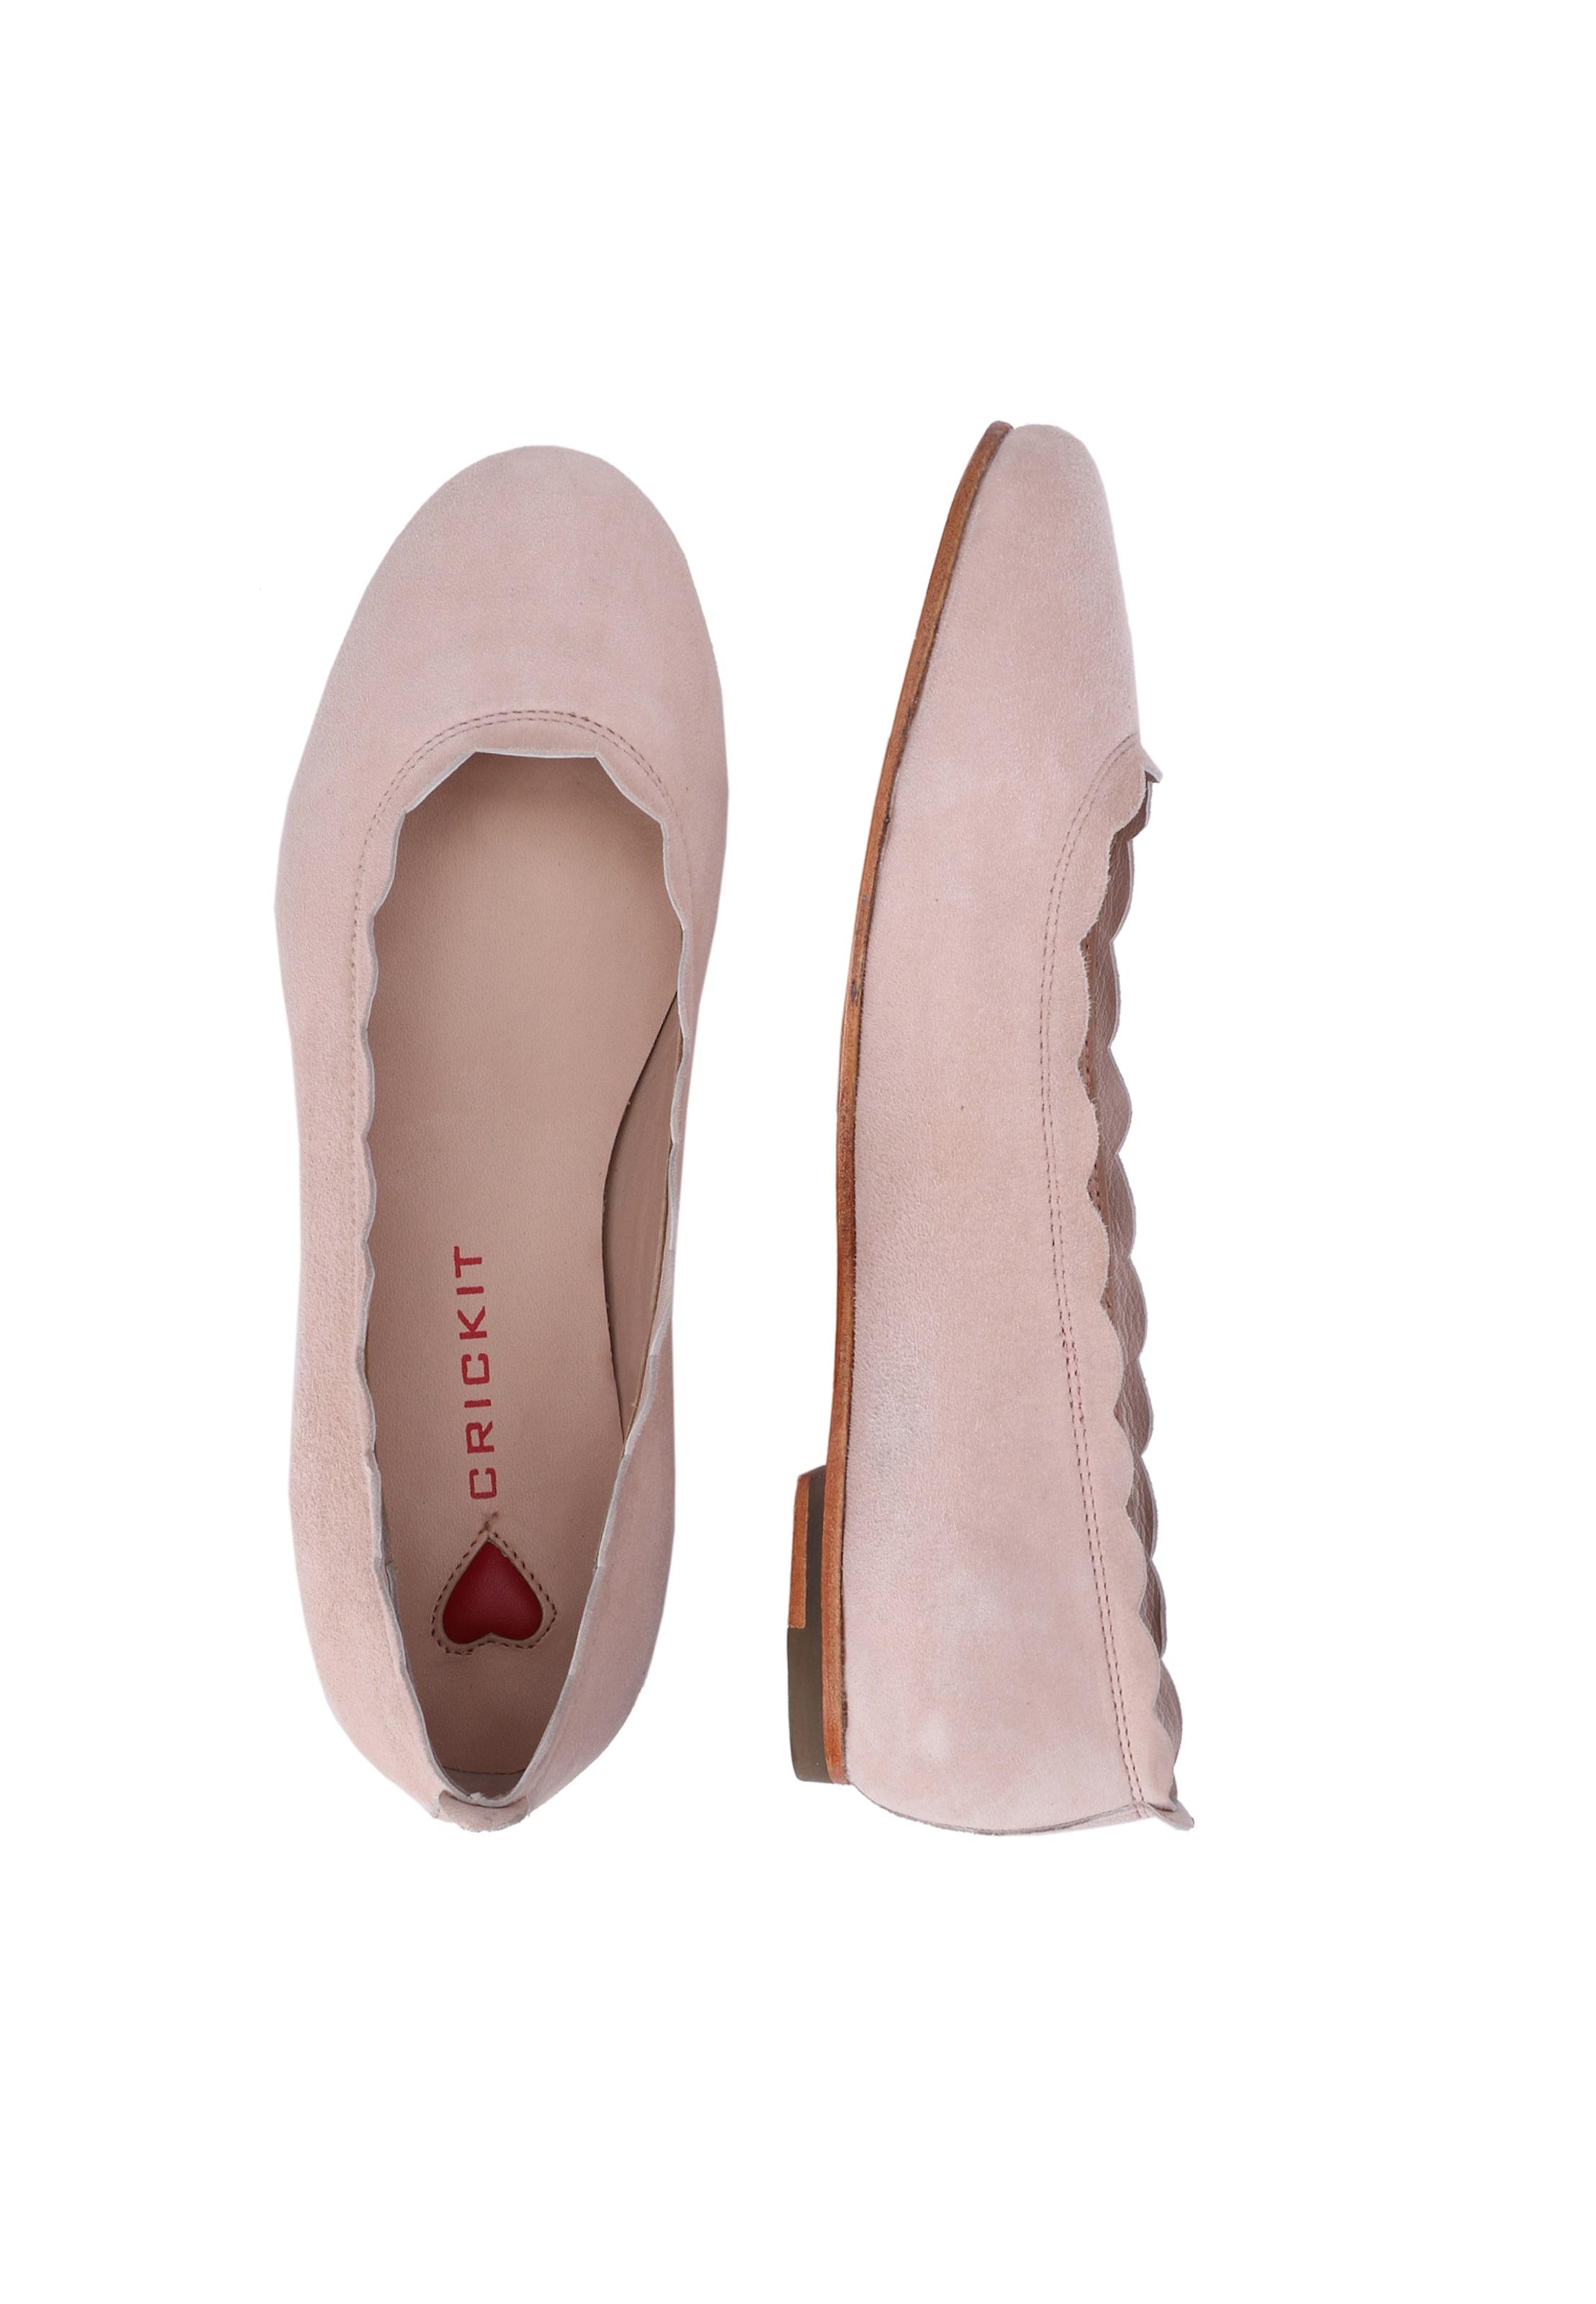 Crickit Pink In In Crickit Ballerinas 'millie' 'millie' Pink Ballerinas Ifgyb6vYm7